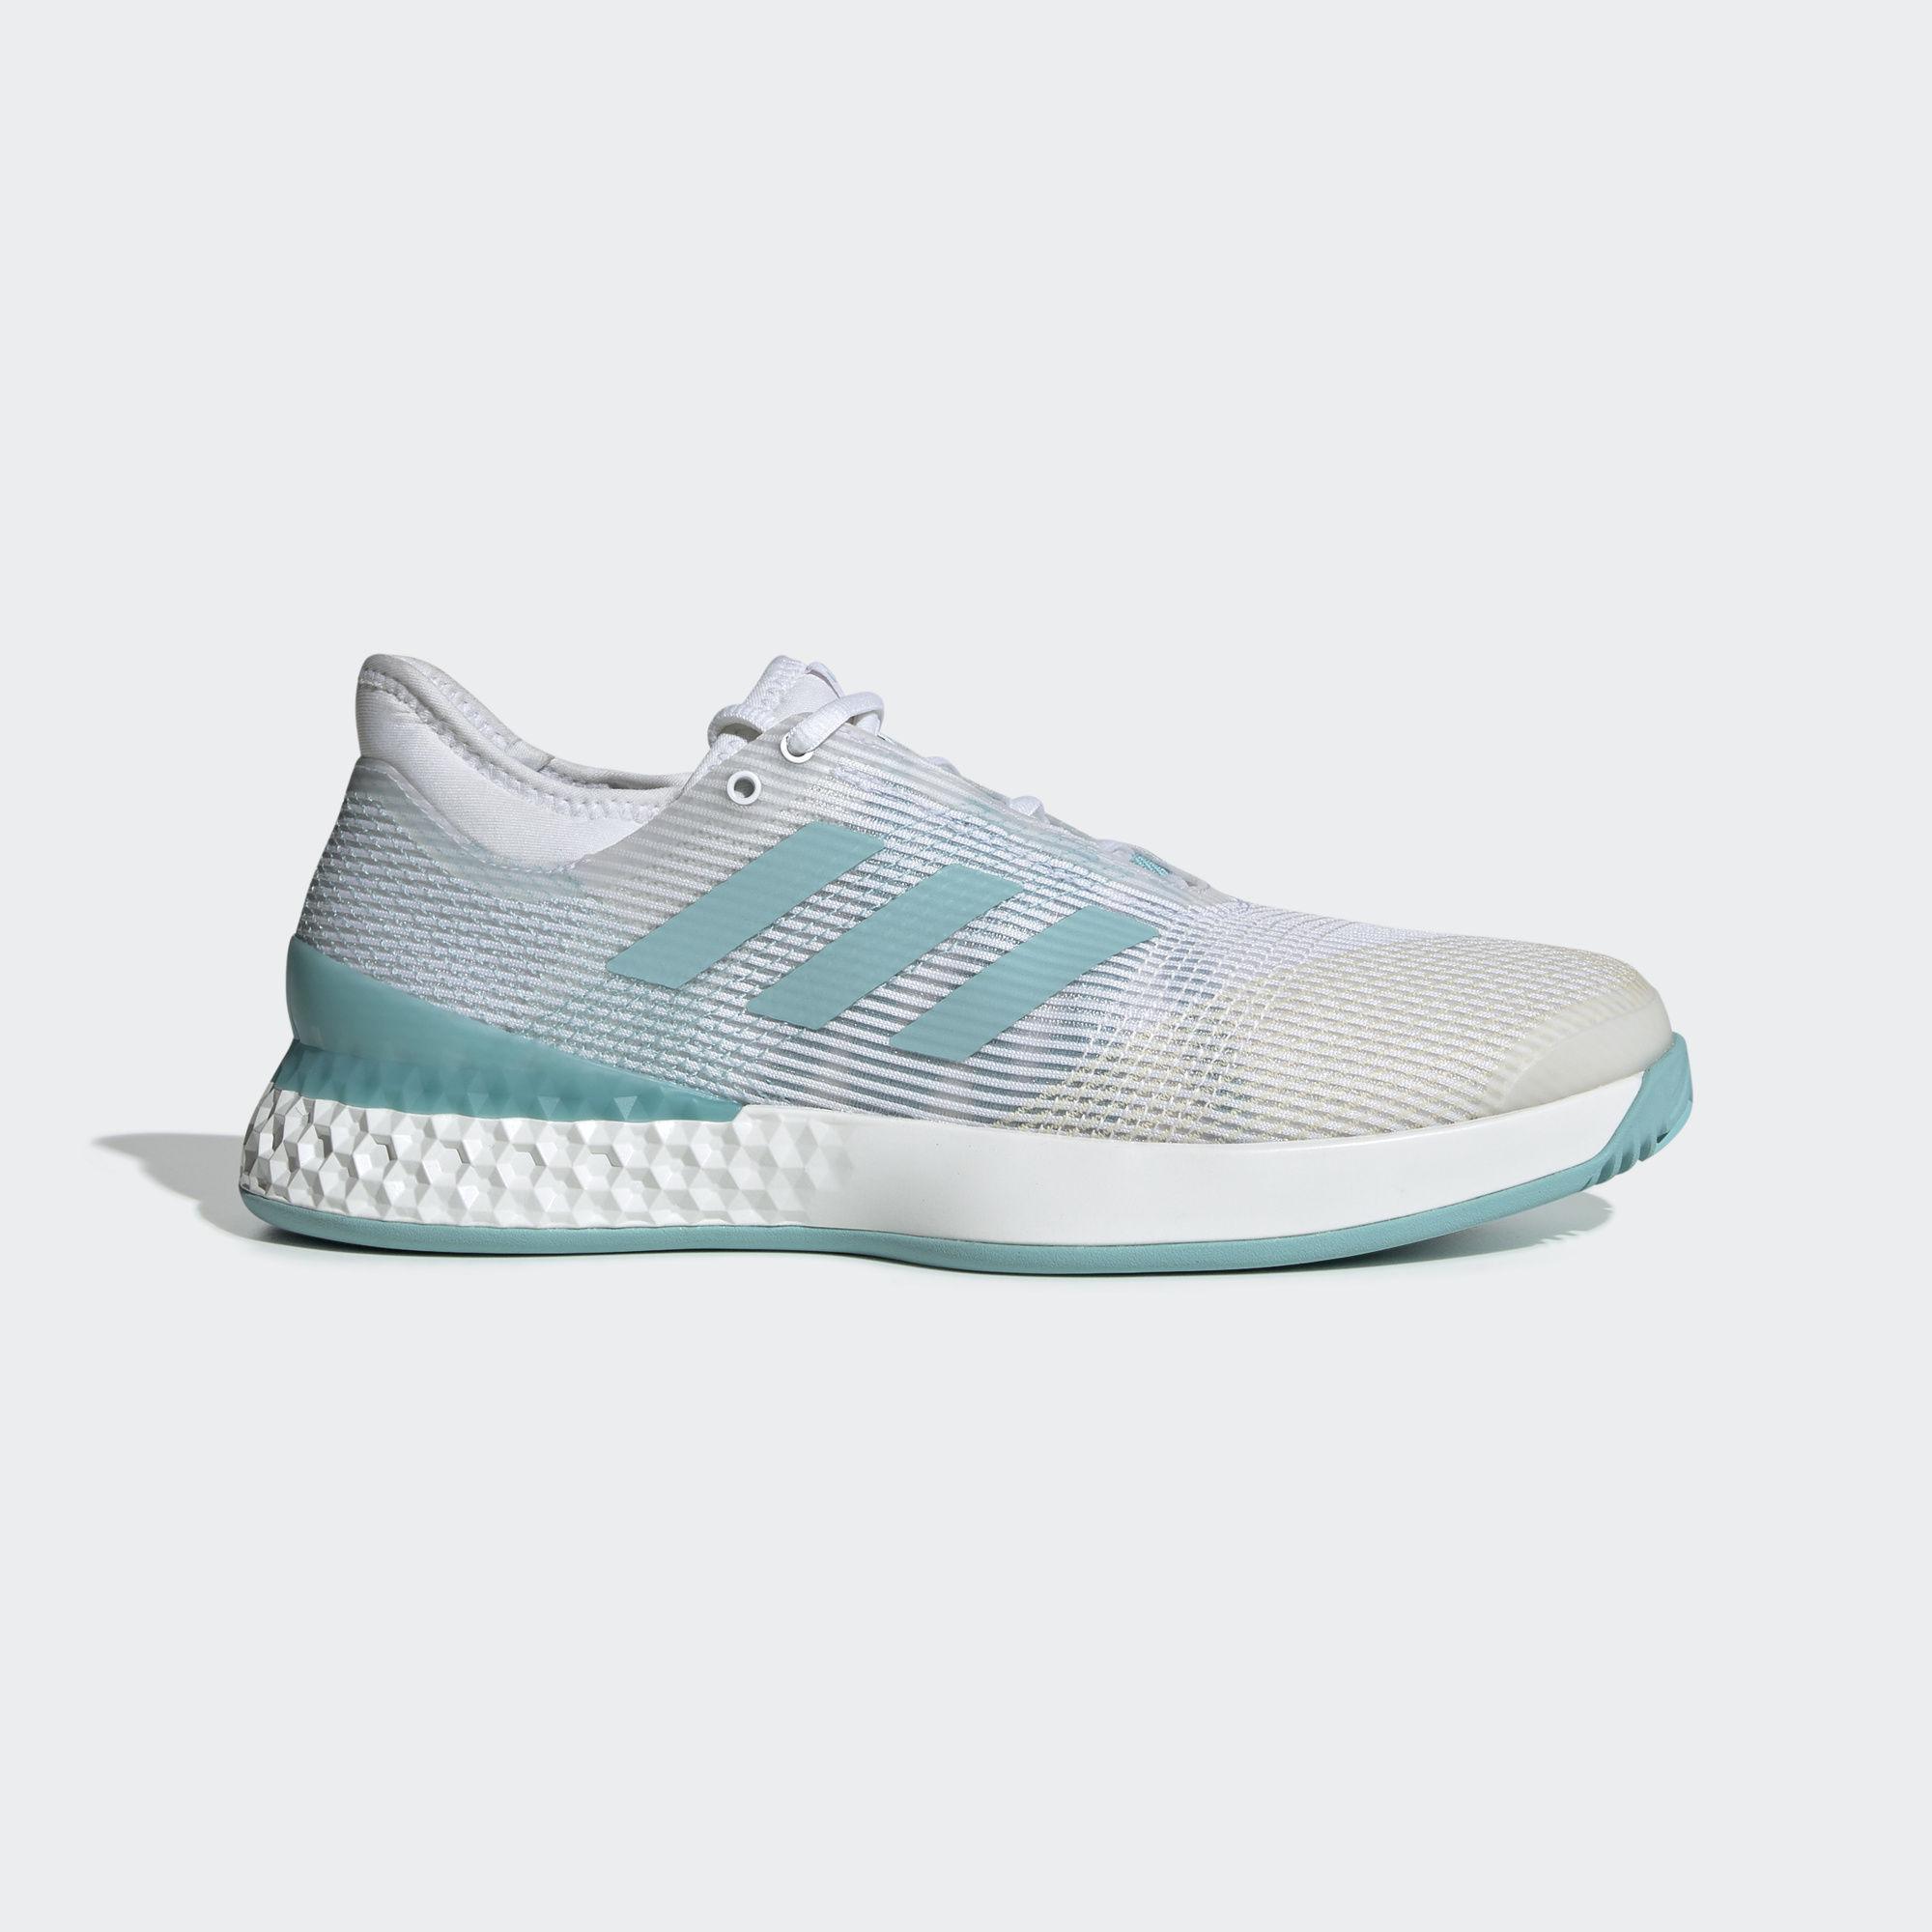 Adidas Mens Adizero Ubersonic 3 Parley